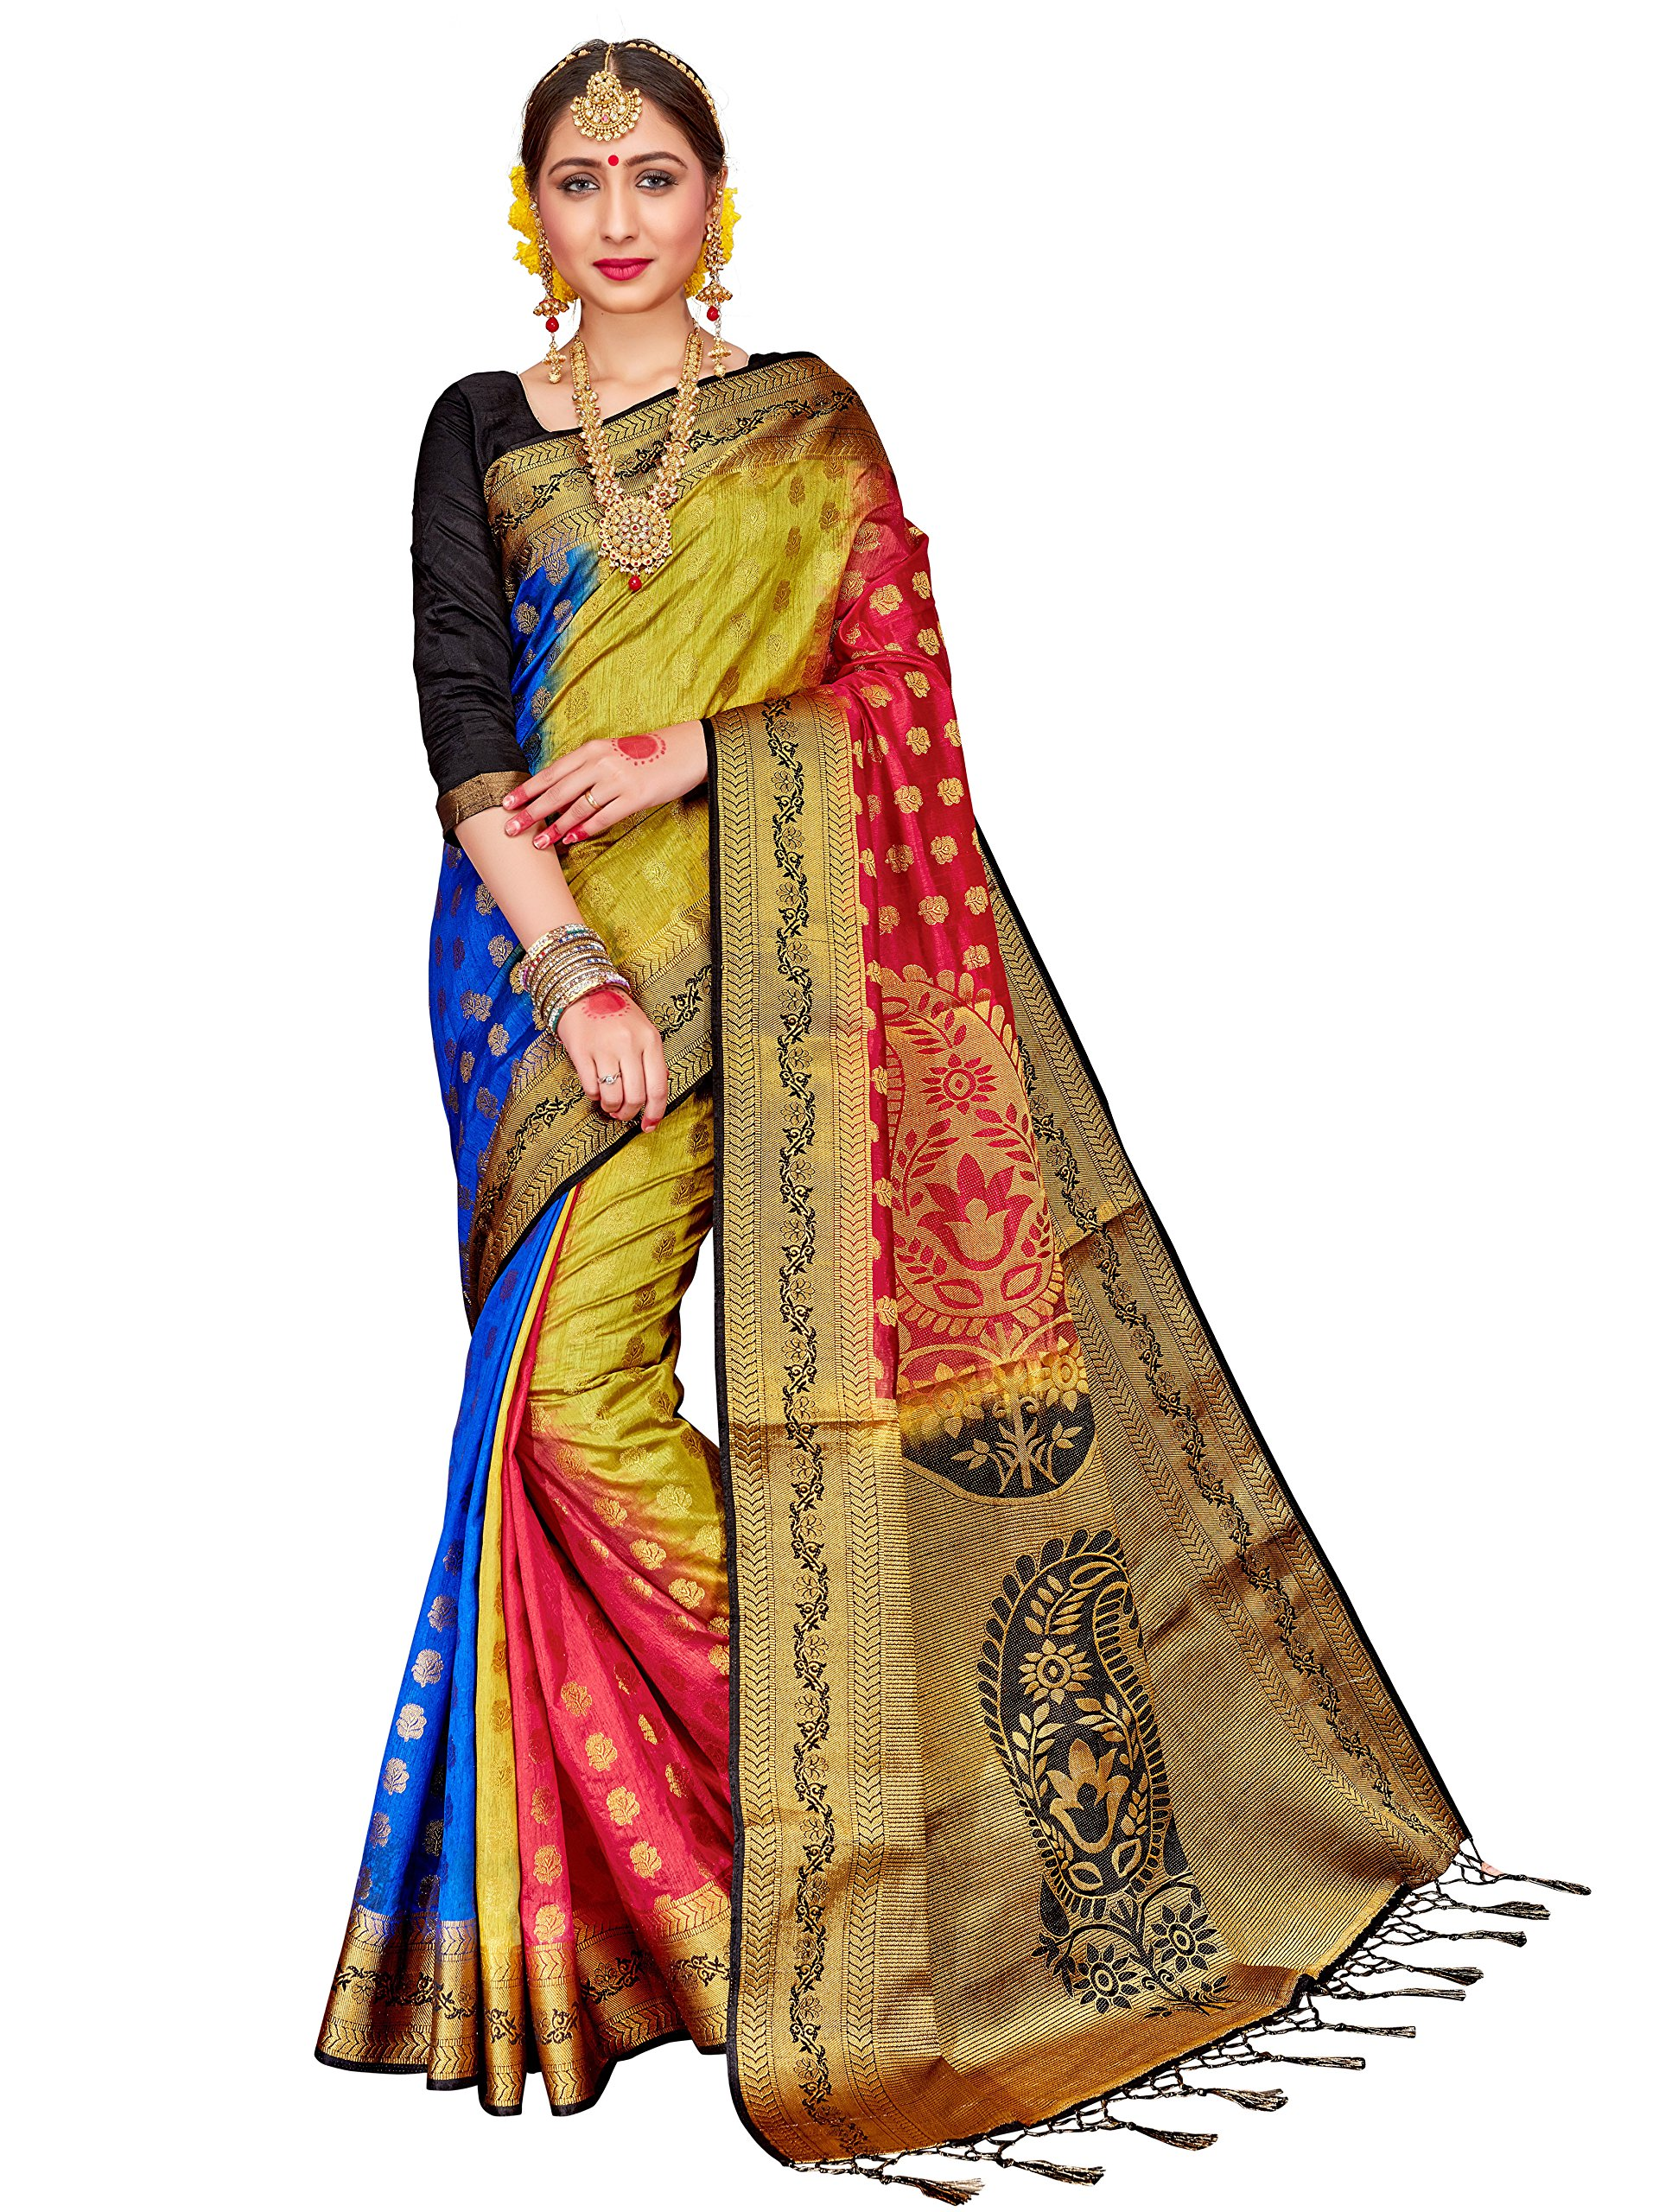 ELINA FASHION Sarees Women's Banarasi Art Silk Woven Work Saree l Indian Wedding Ethnic Sari & Blouse Piece (Multi)